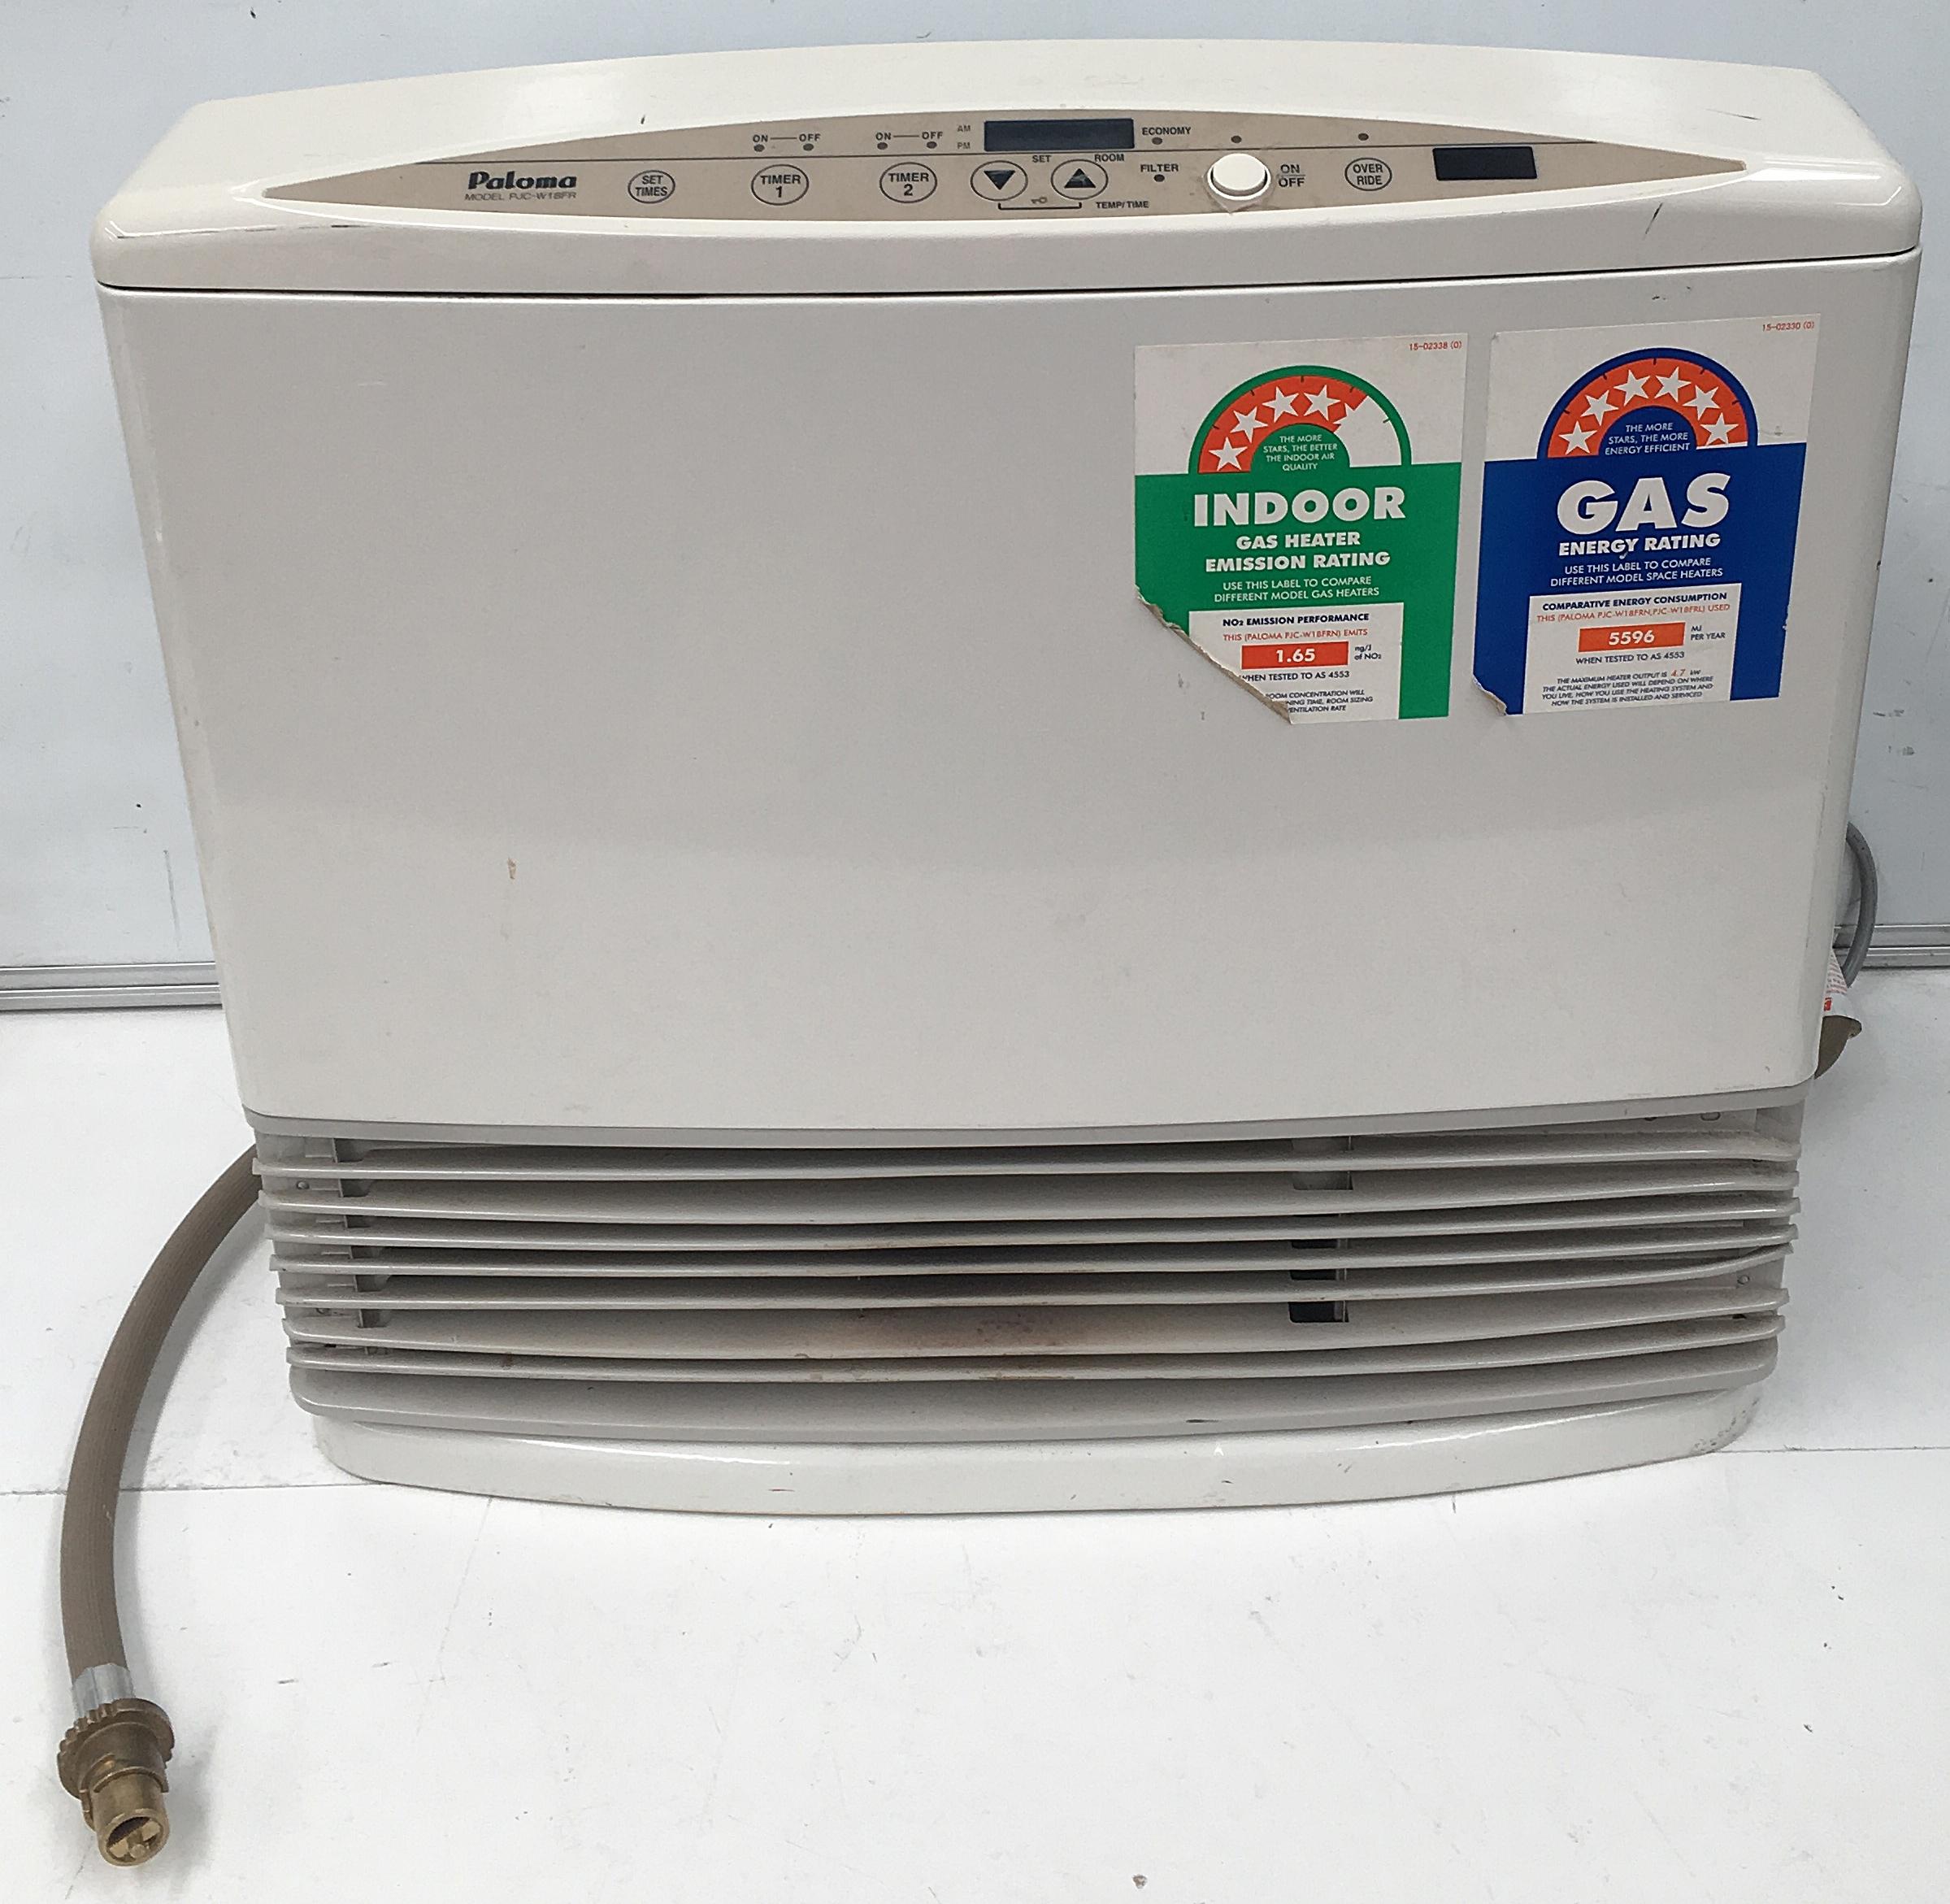 Paloma PJC-W18FR Indoor Gas Heater - Lot 891166 | ALLBIDS